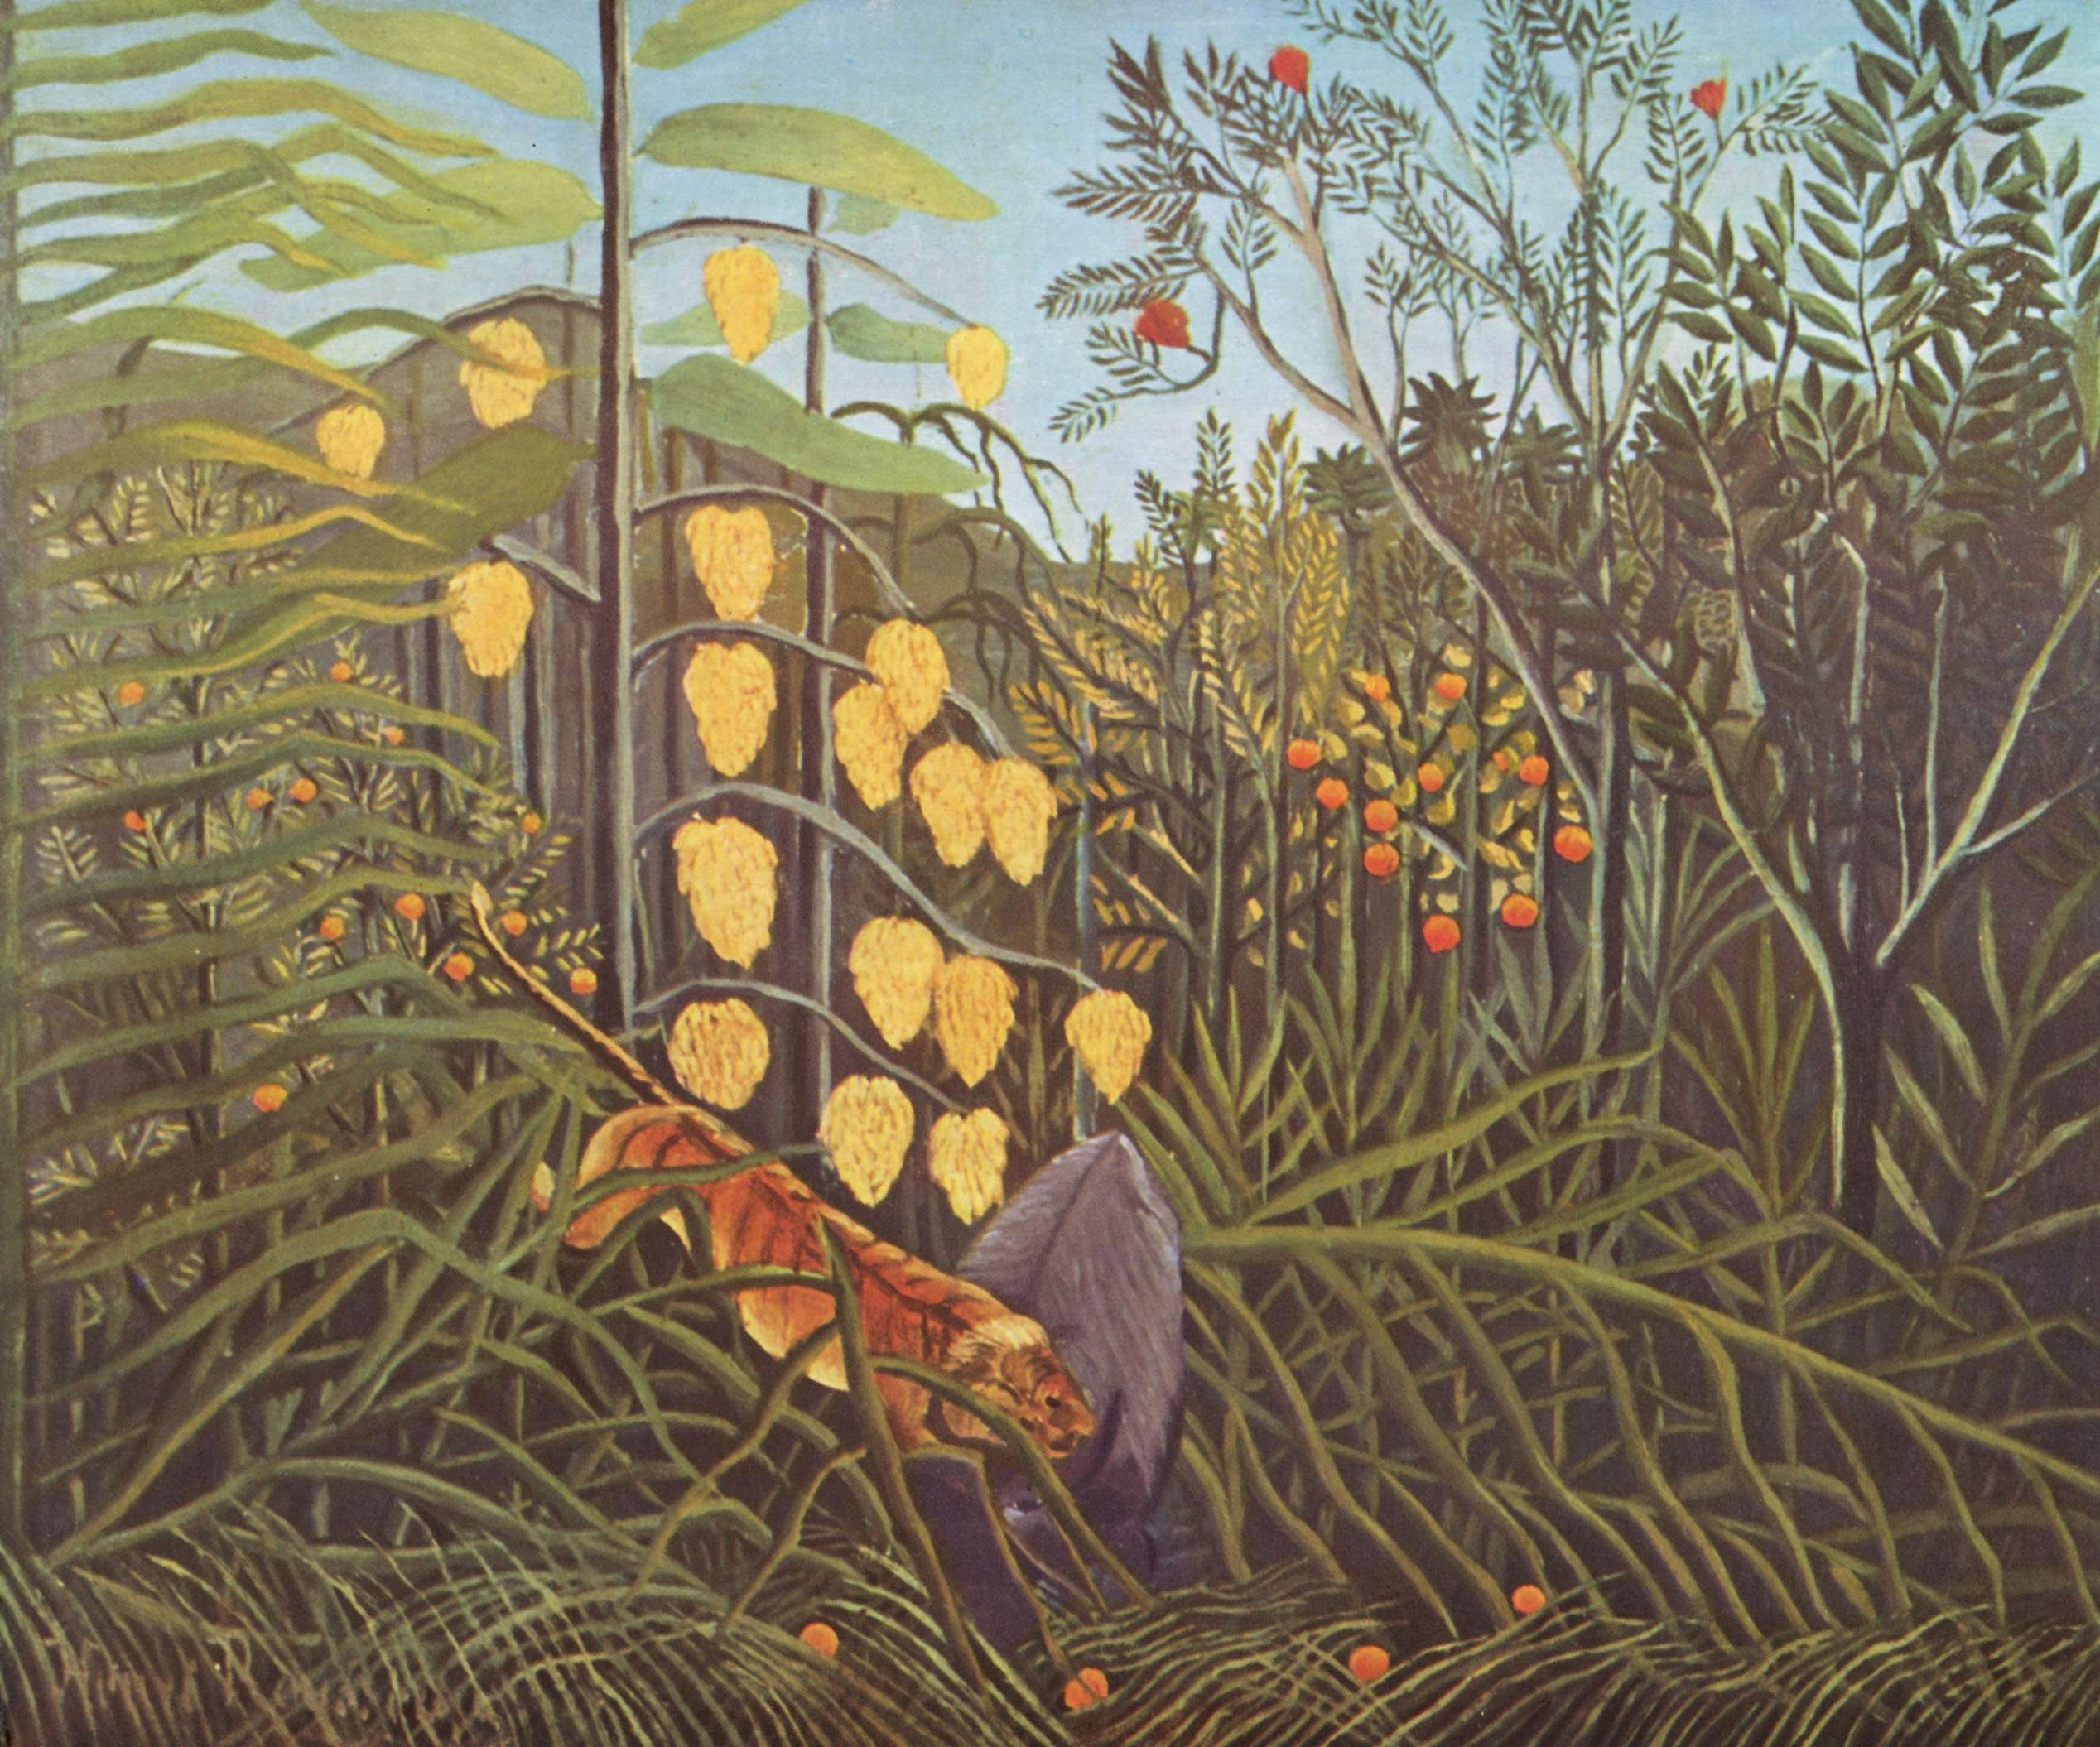 http://upload.wikimedia.org/wikipedia/commons/f/f5/Henri_Rousseau_008.jpg